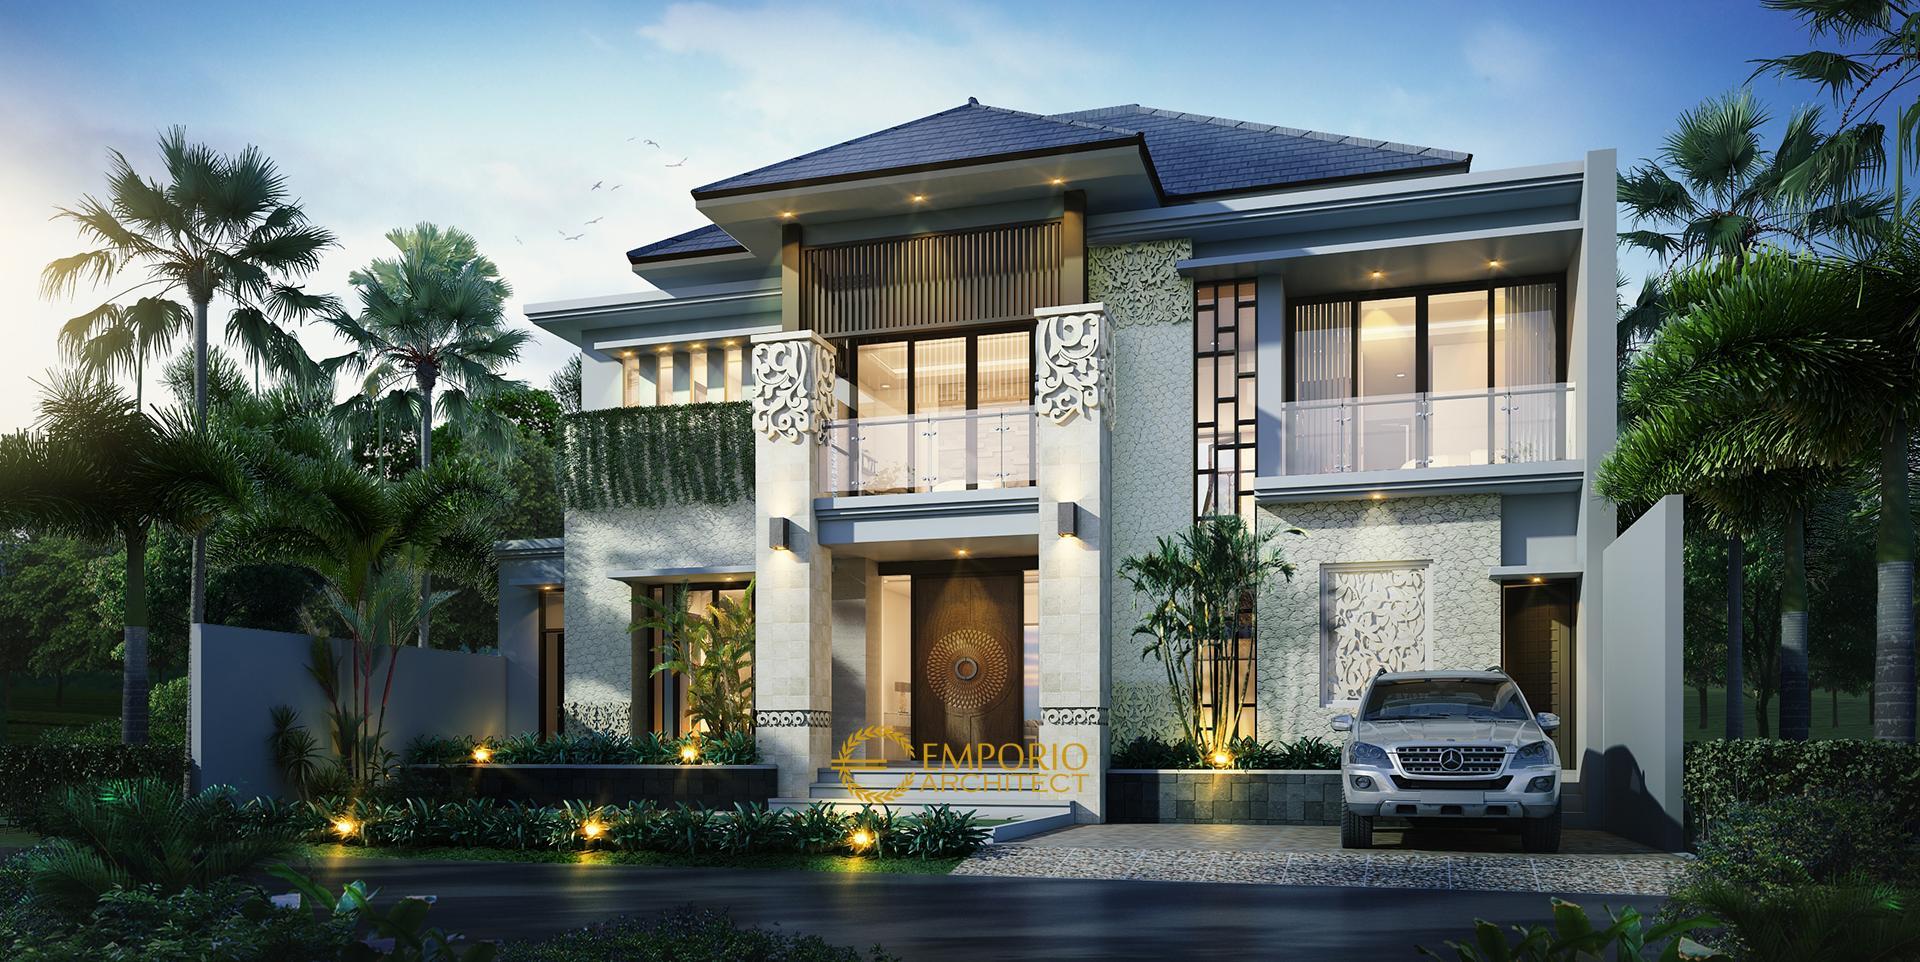 Desain Rumah Villa Bali 2 Lantai Bapak Faishal di  Bintaro, Jakarta Selatan